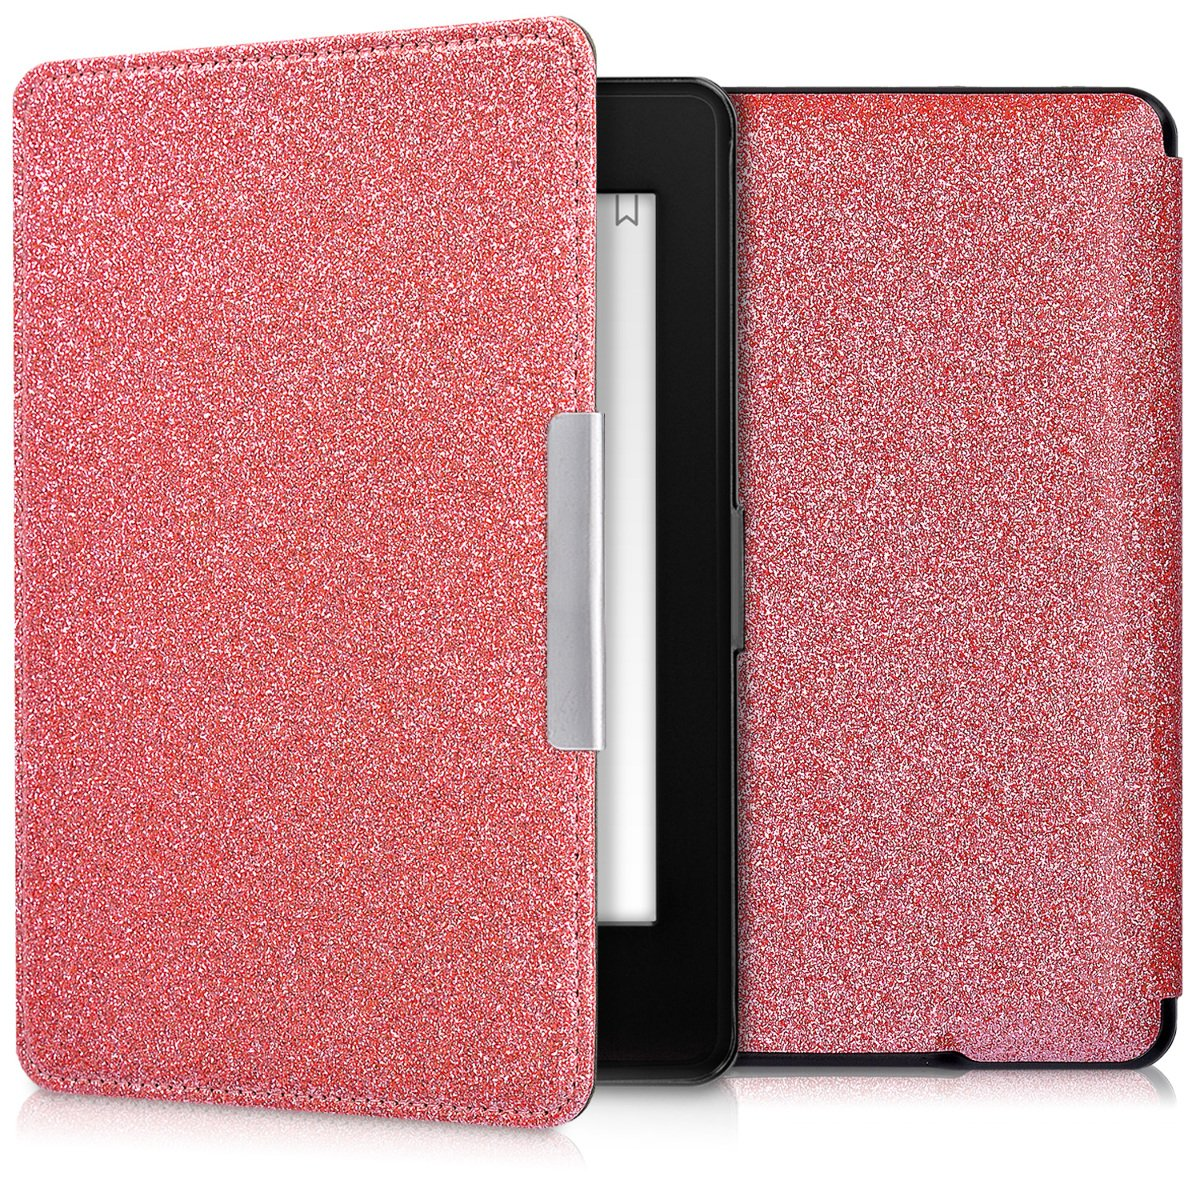 kwmobile Cover for Amazon Kindle Paperwhite - flip cover case eReader protective case in plastic - flip case eReader bookstyle Design Glitter uniform light pink